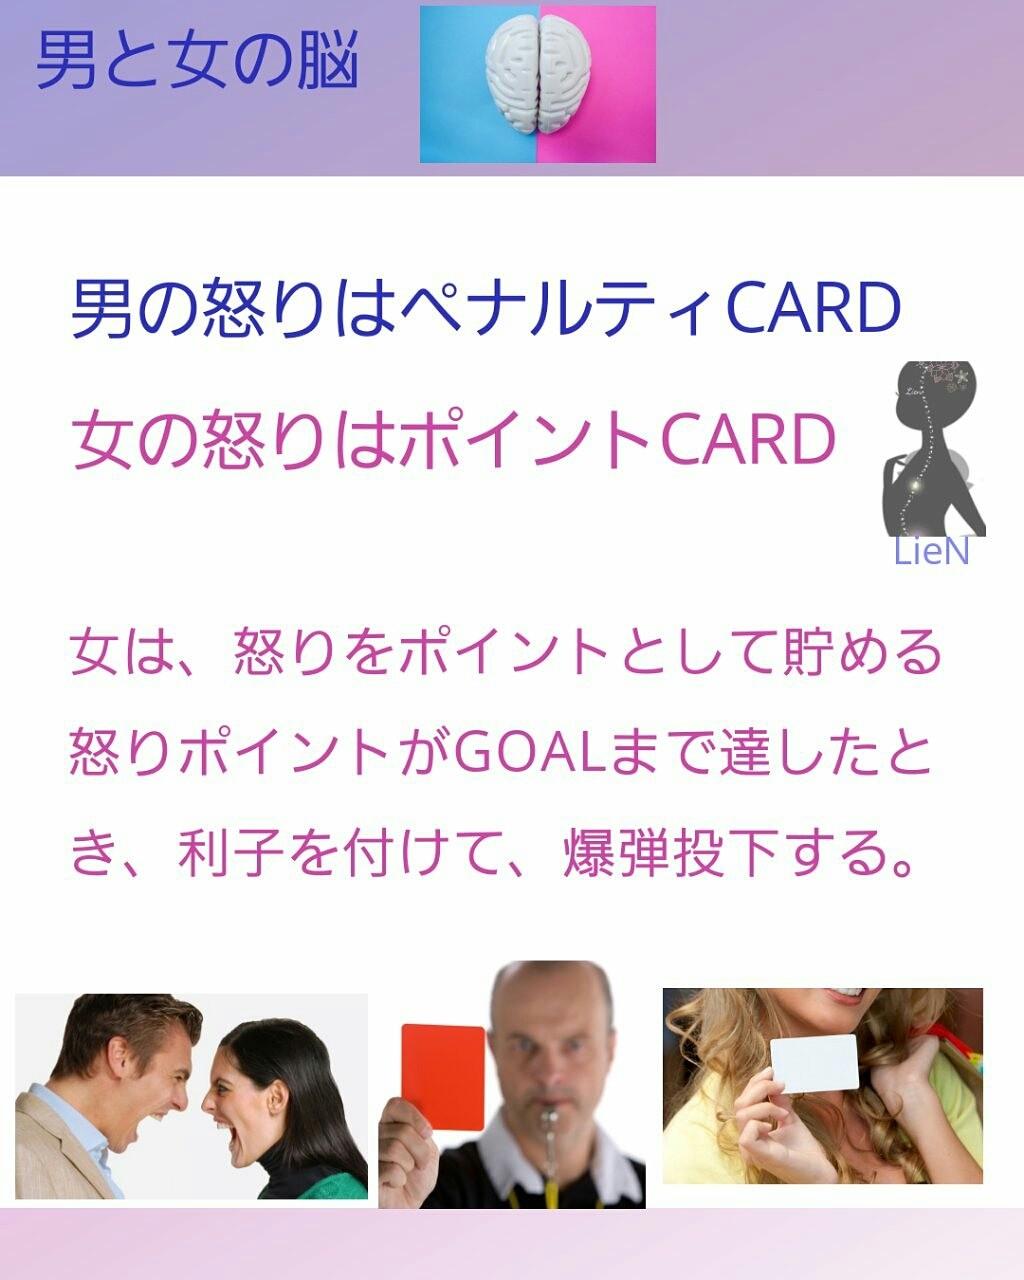 f:id:yuyu-s:20200113115630j:image